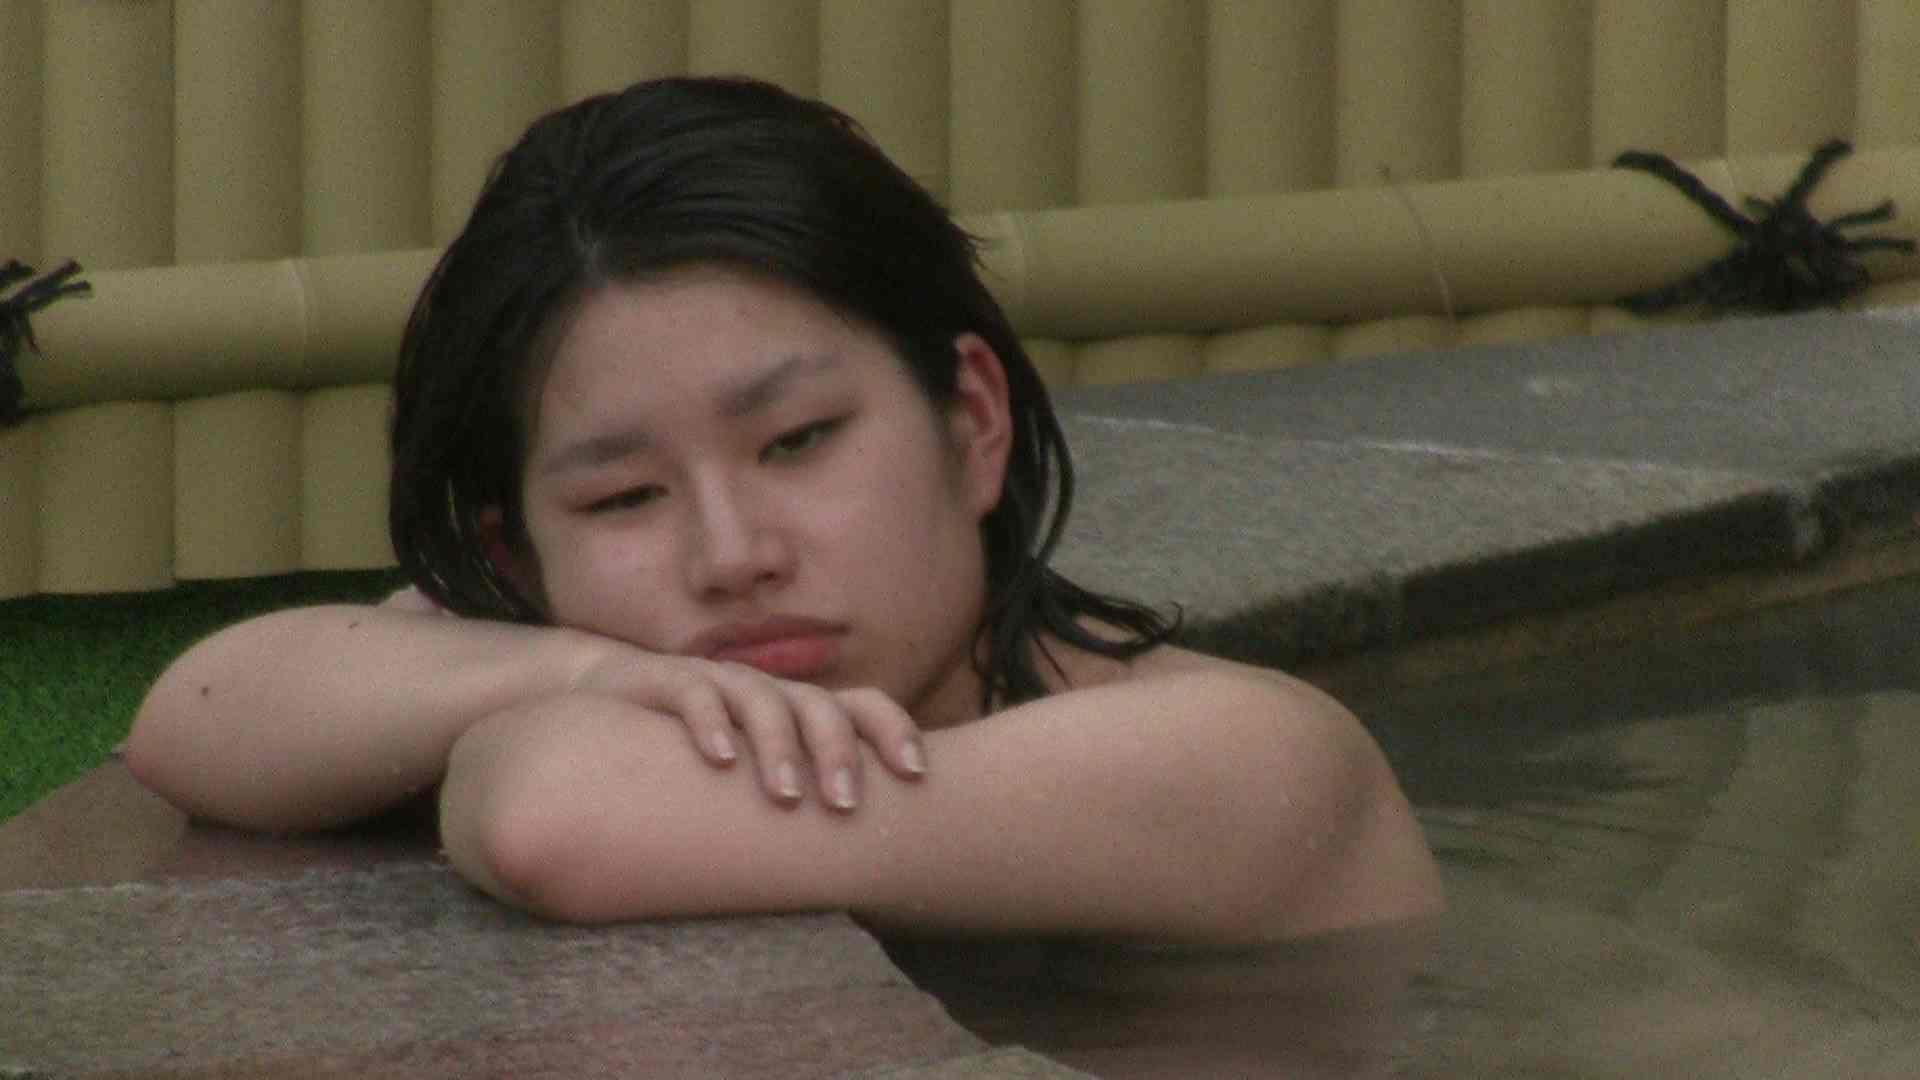 Aquaな露天風呂Vol.230 盗撮 | OLエロ画像  31PICs 16